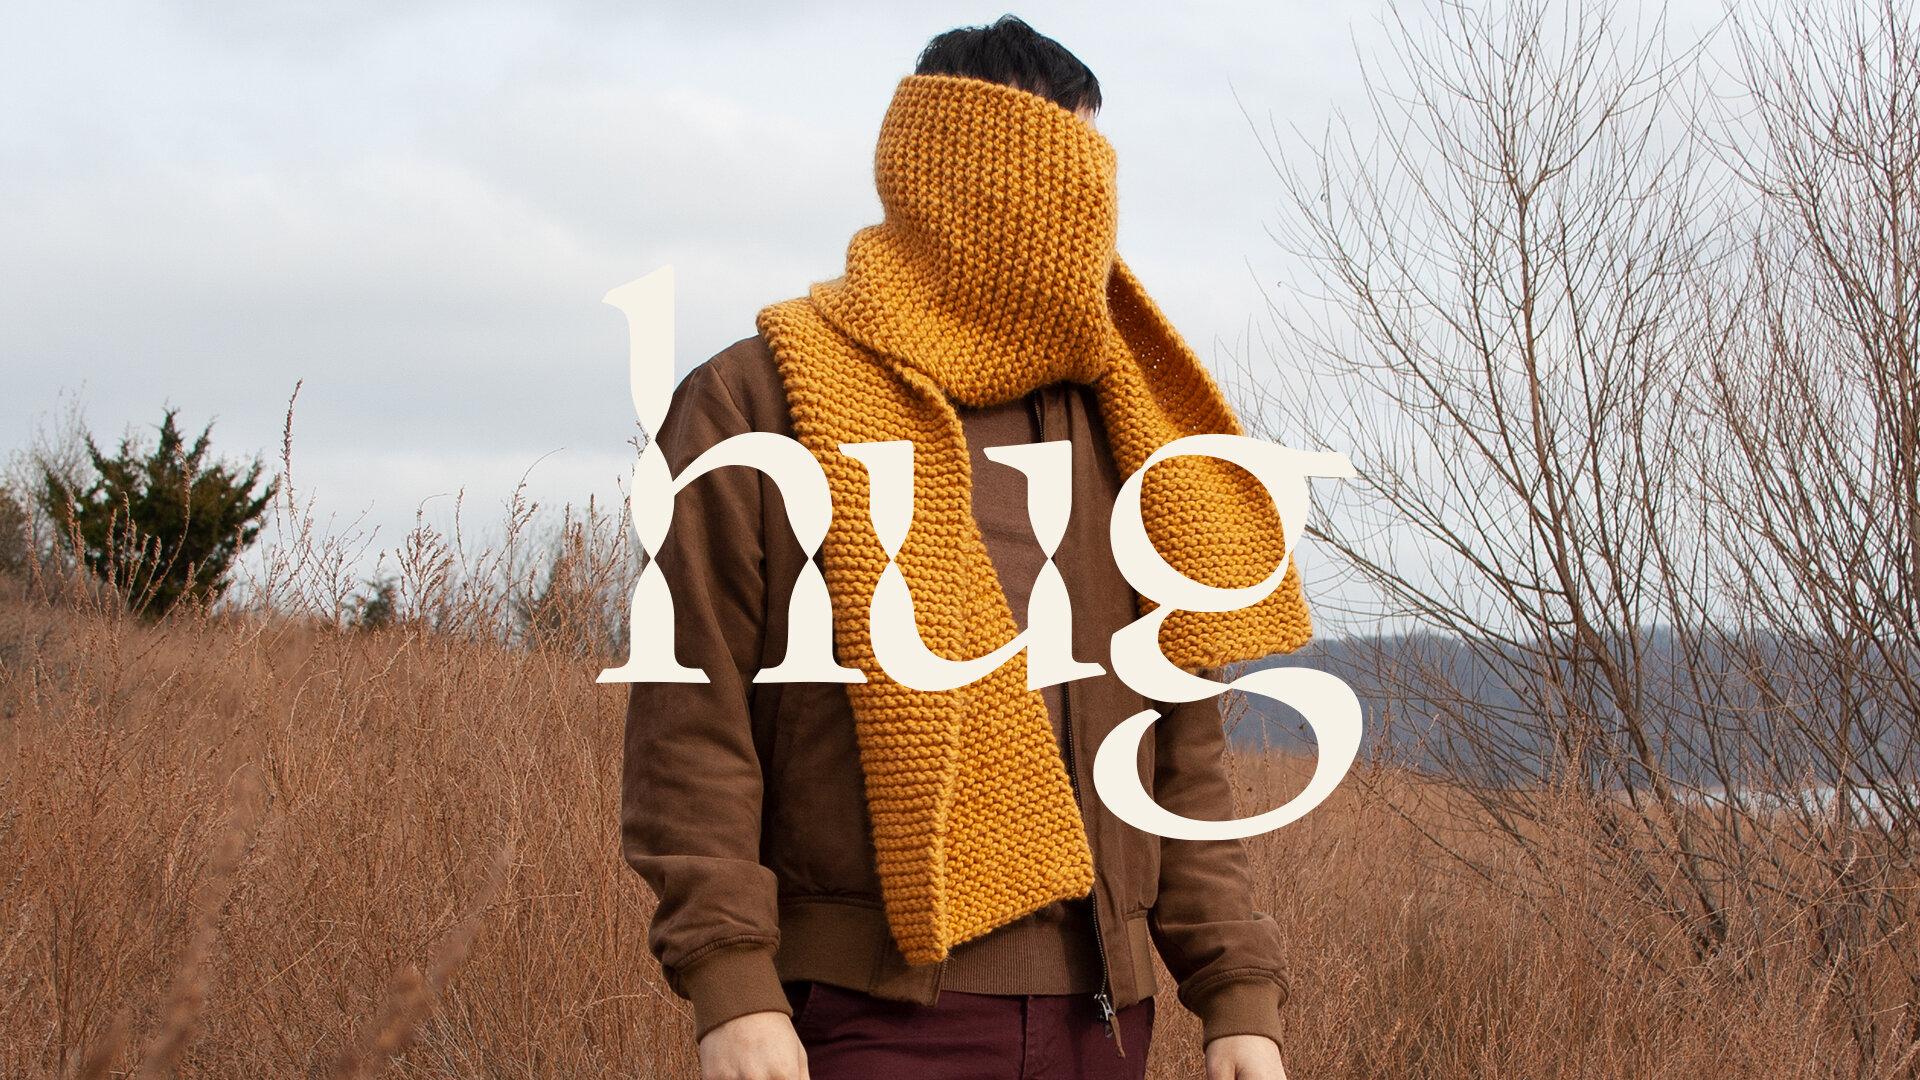 Hug_KeyArt2.jpg